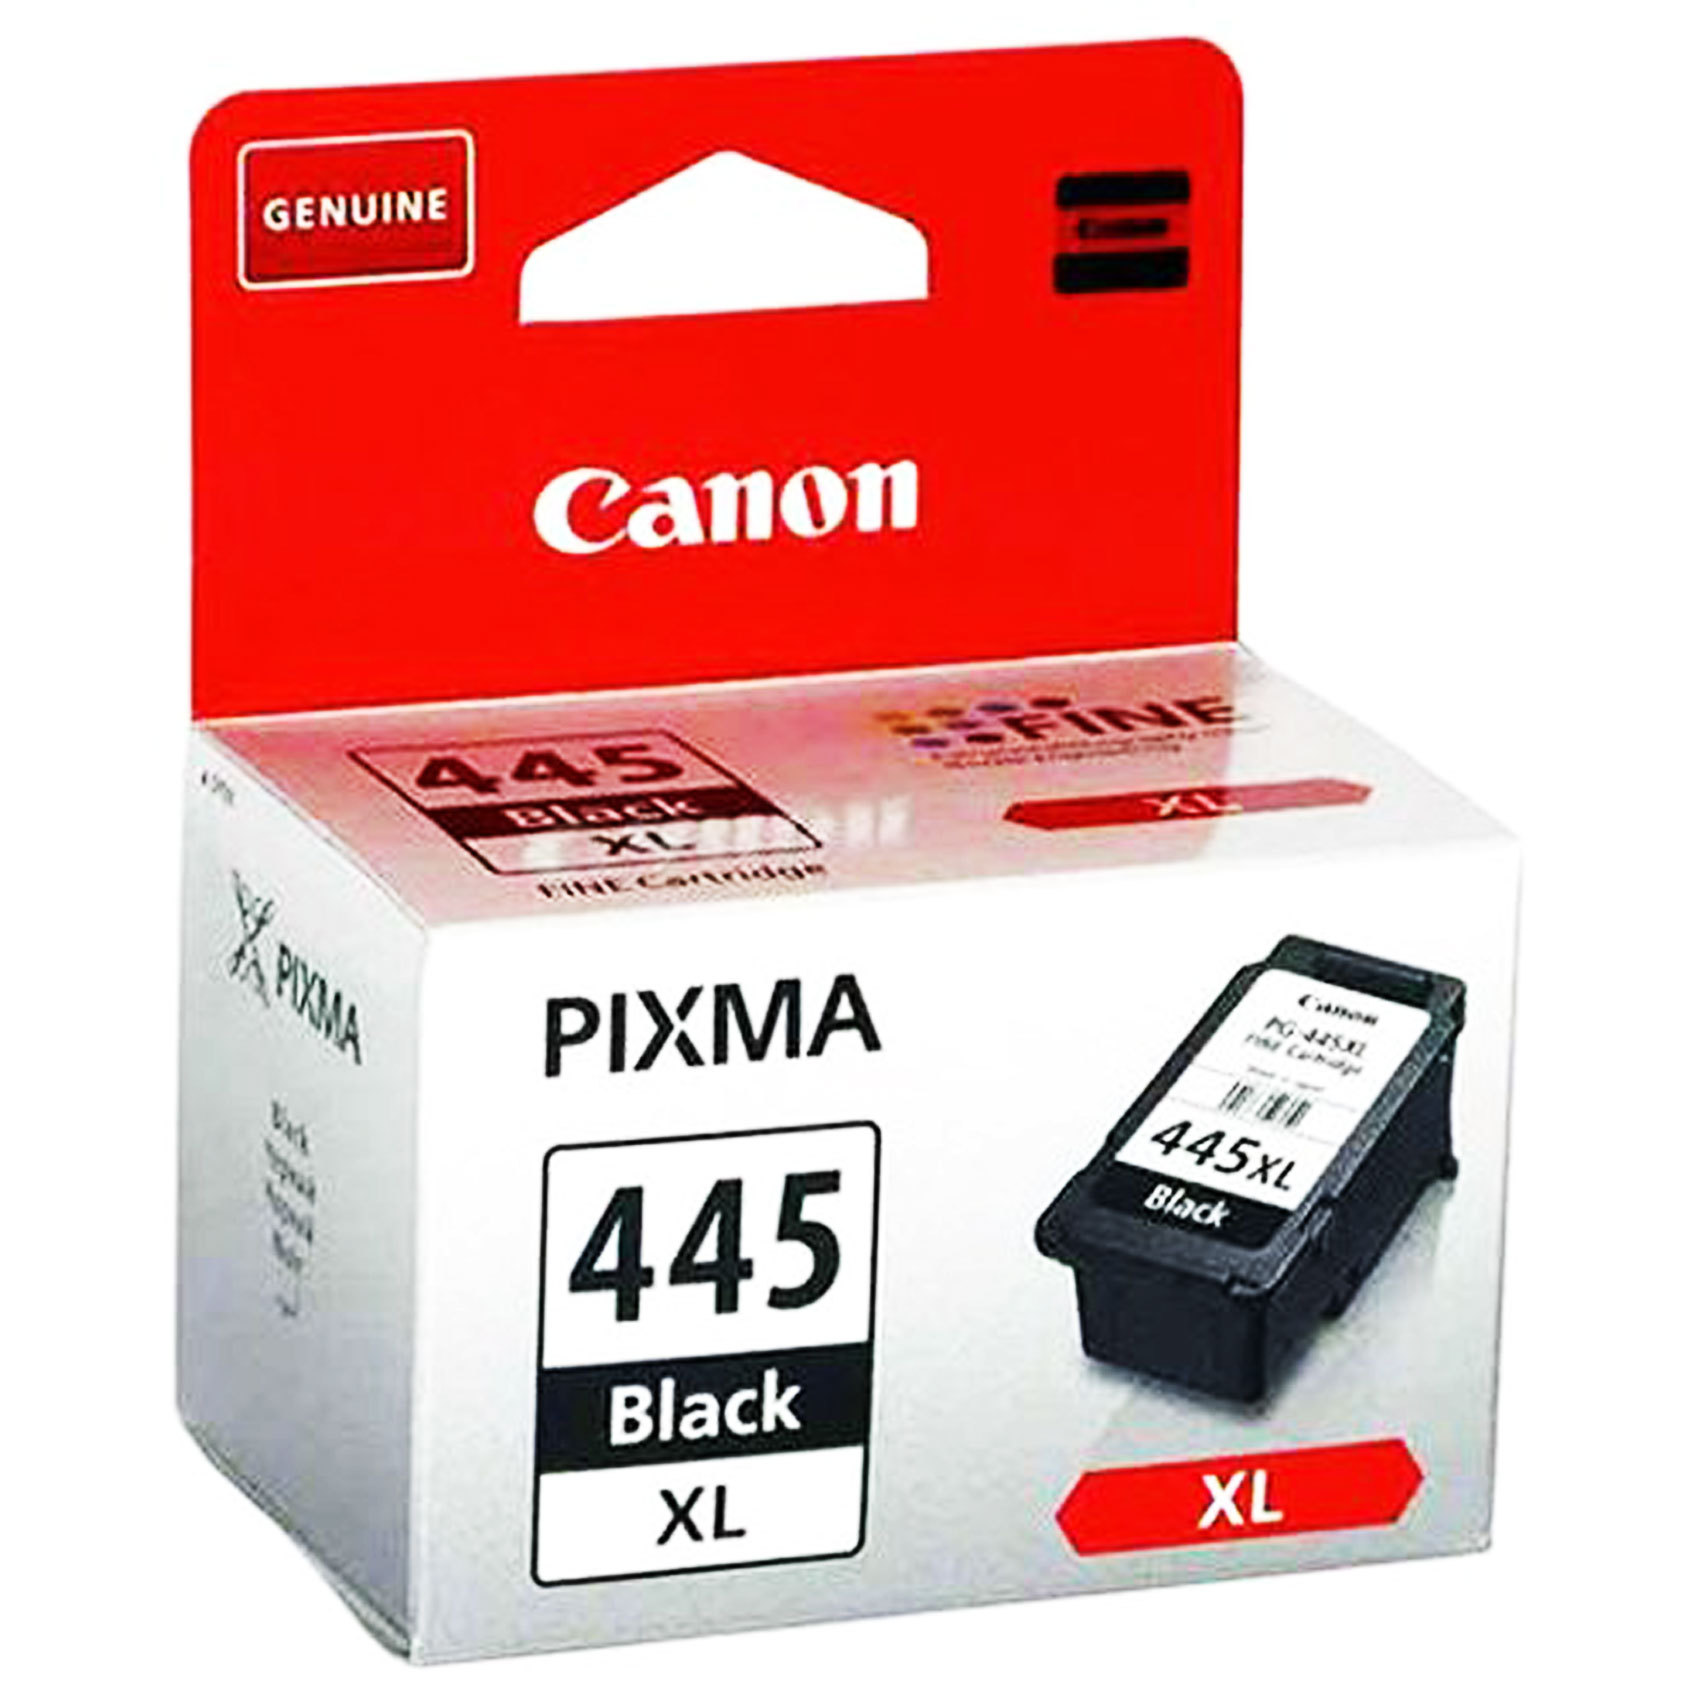 CANON CART PG445 XL BLACK